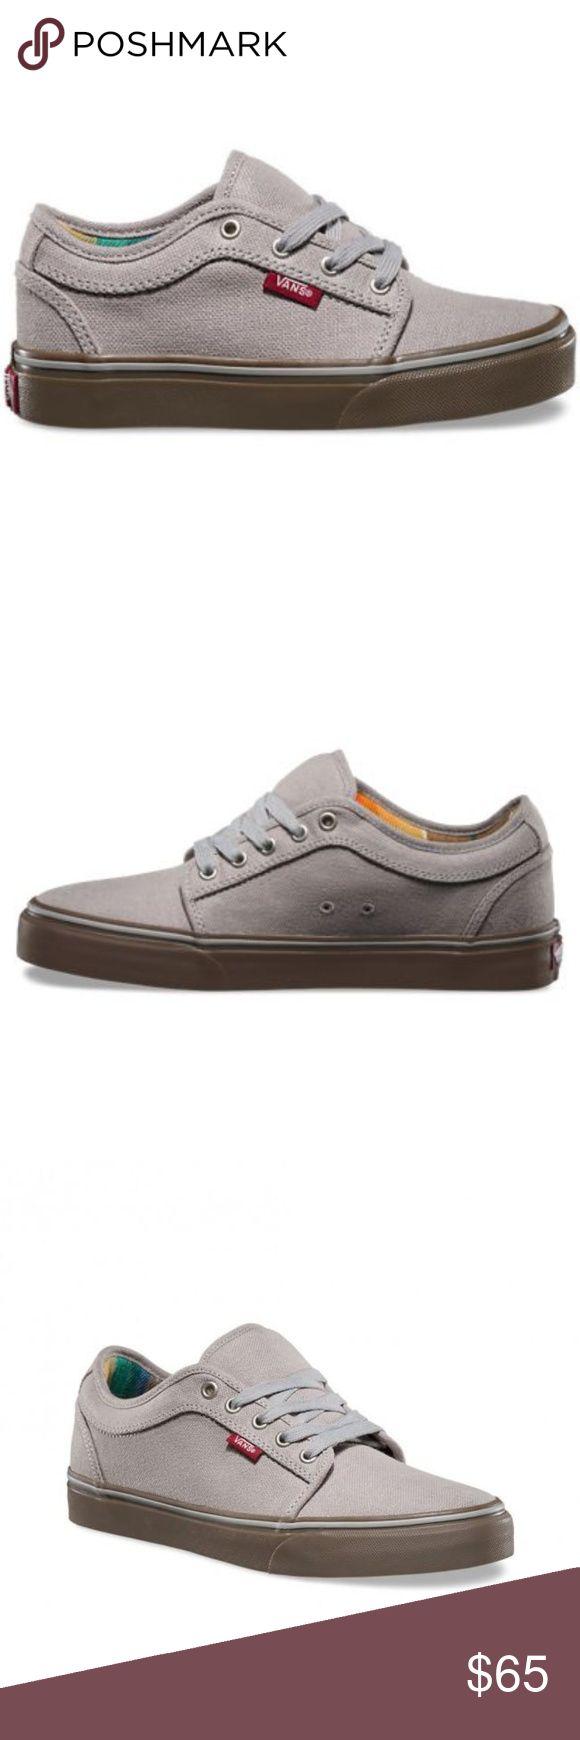 Vans Chukka Low Sneakers (Aztec Stripe) Light Grey Vans Chukka Low Sneakers (Aztec Stripe) Light Grey/Gum Womens 7.5 = Mens 6 Vans Shoes Sneakers